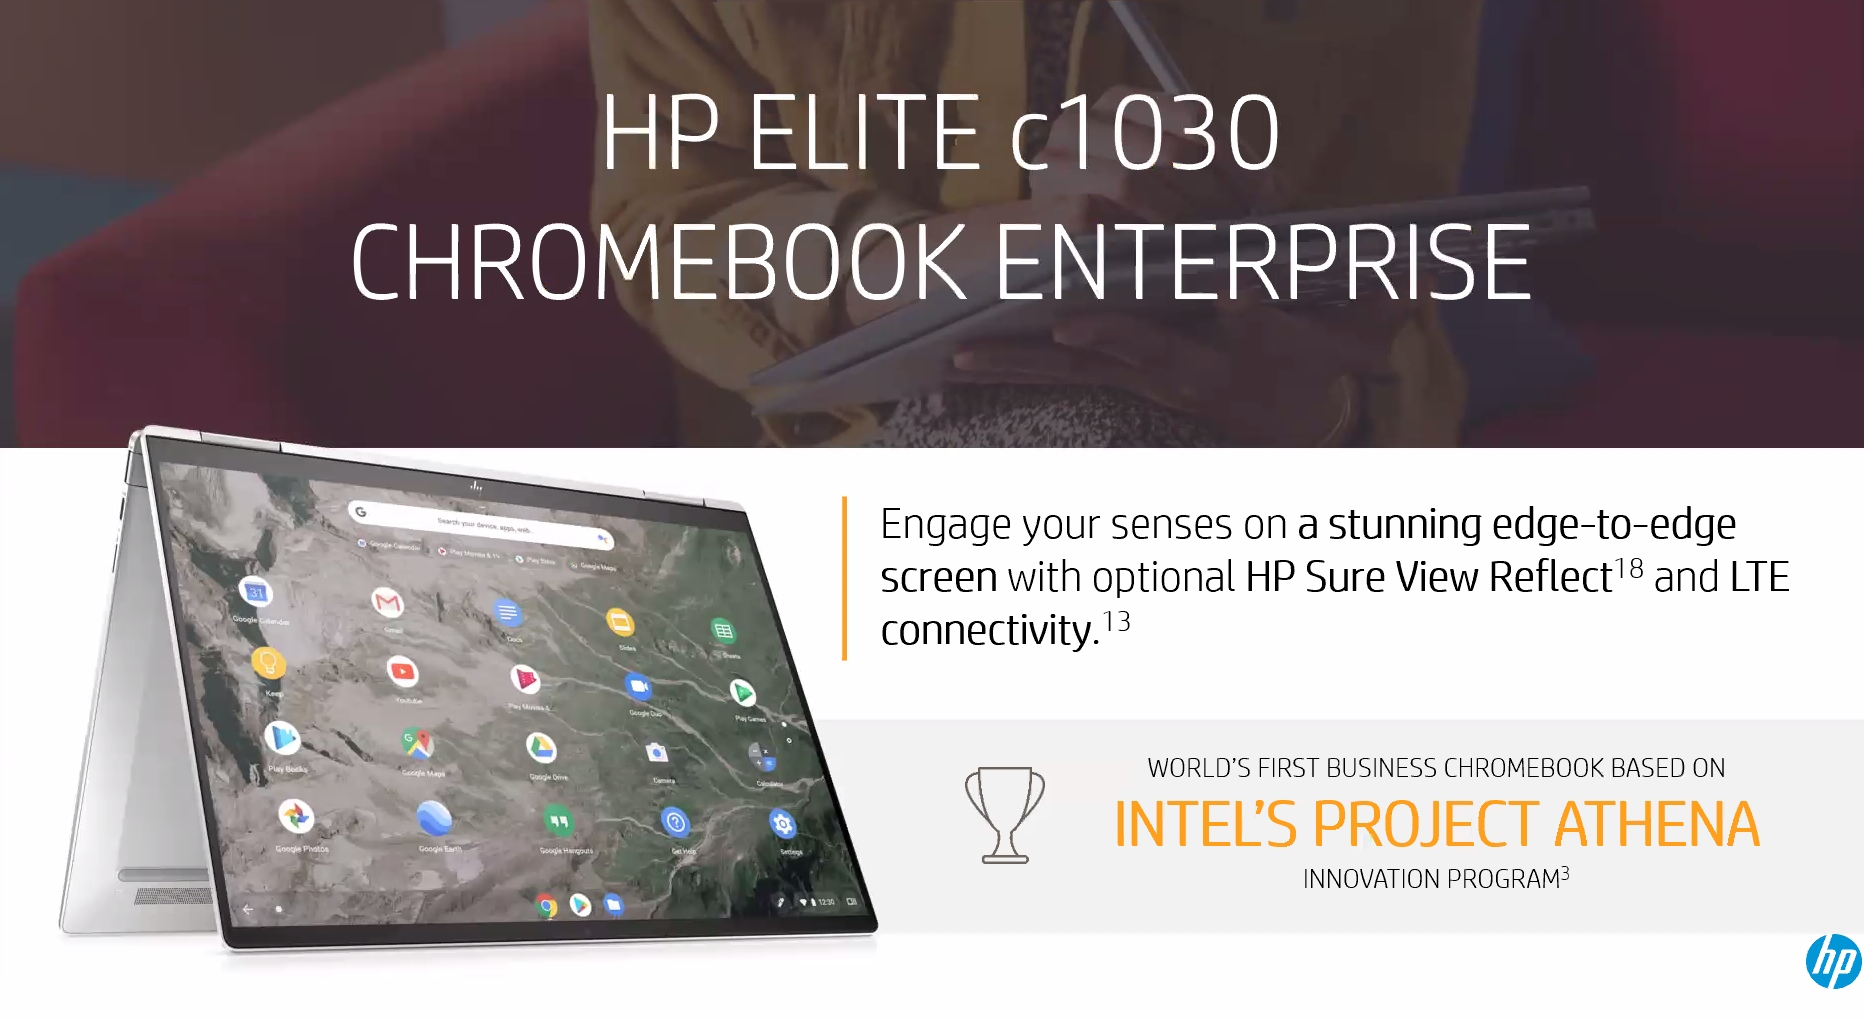 hp elite c1030 chromebook enterprise_01